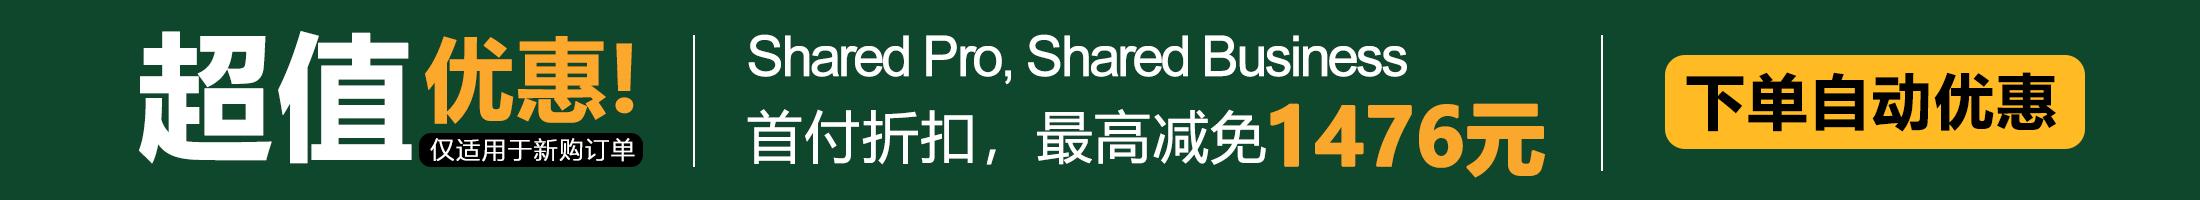 sugarhosts:香港/洛杉矶cn2,虚拟主机6折,VPS7折,建站推荐插图1